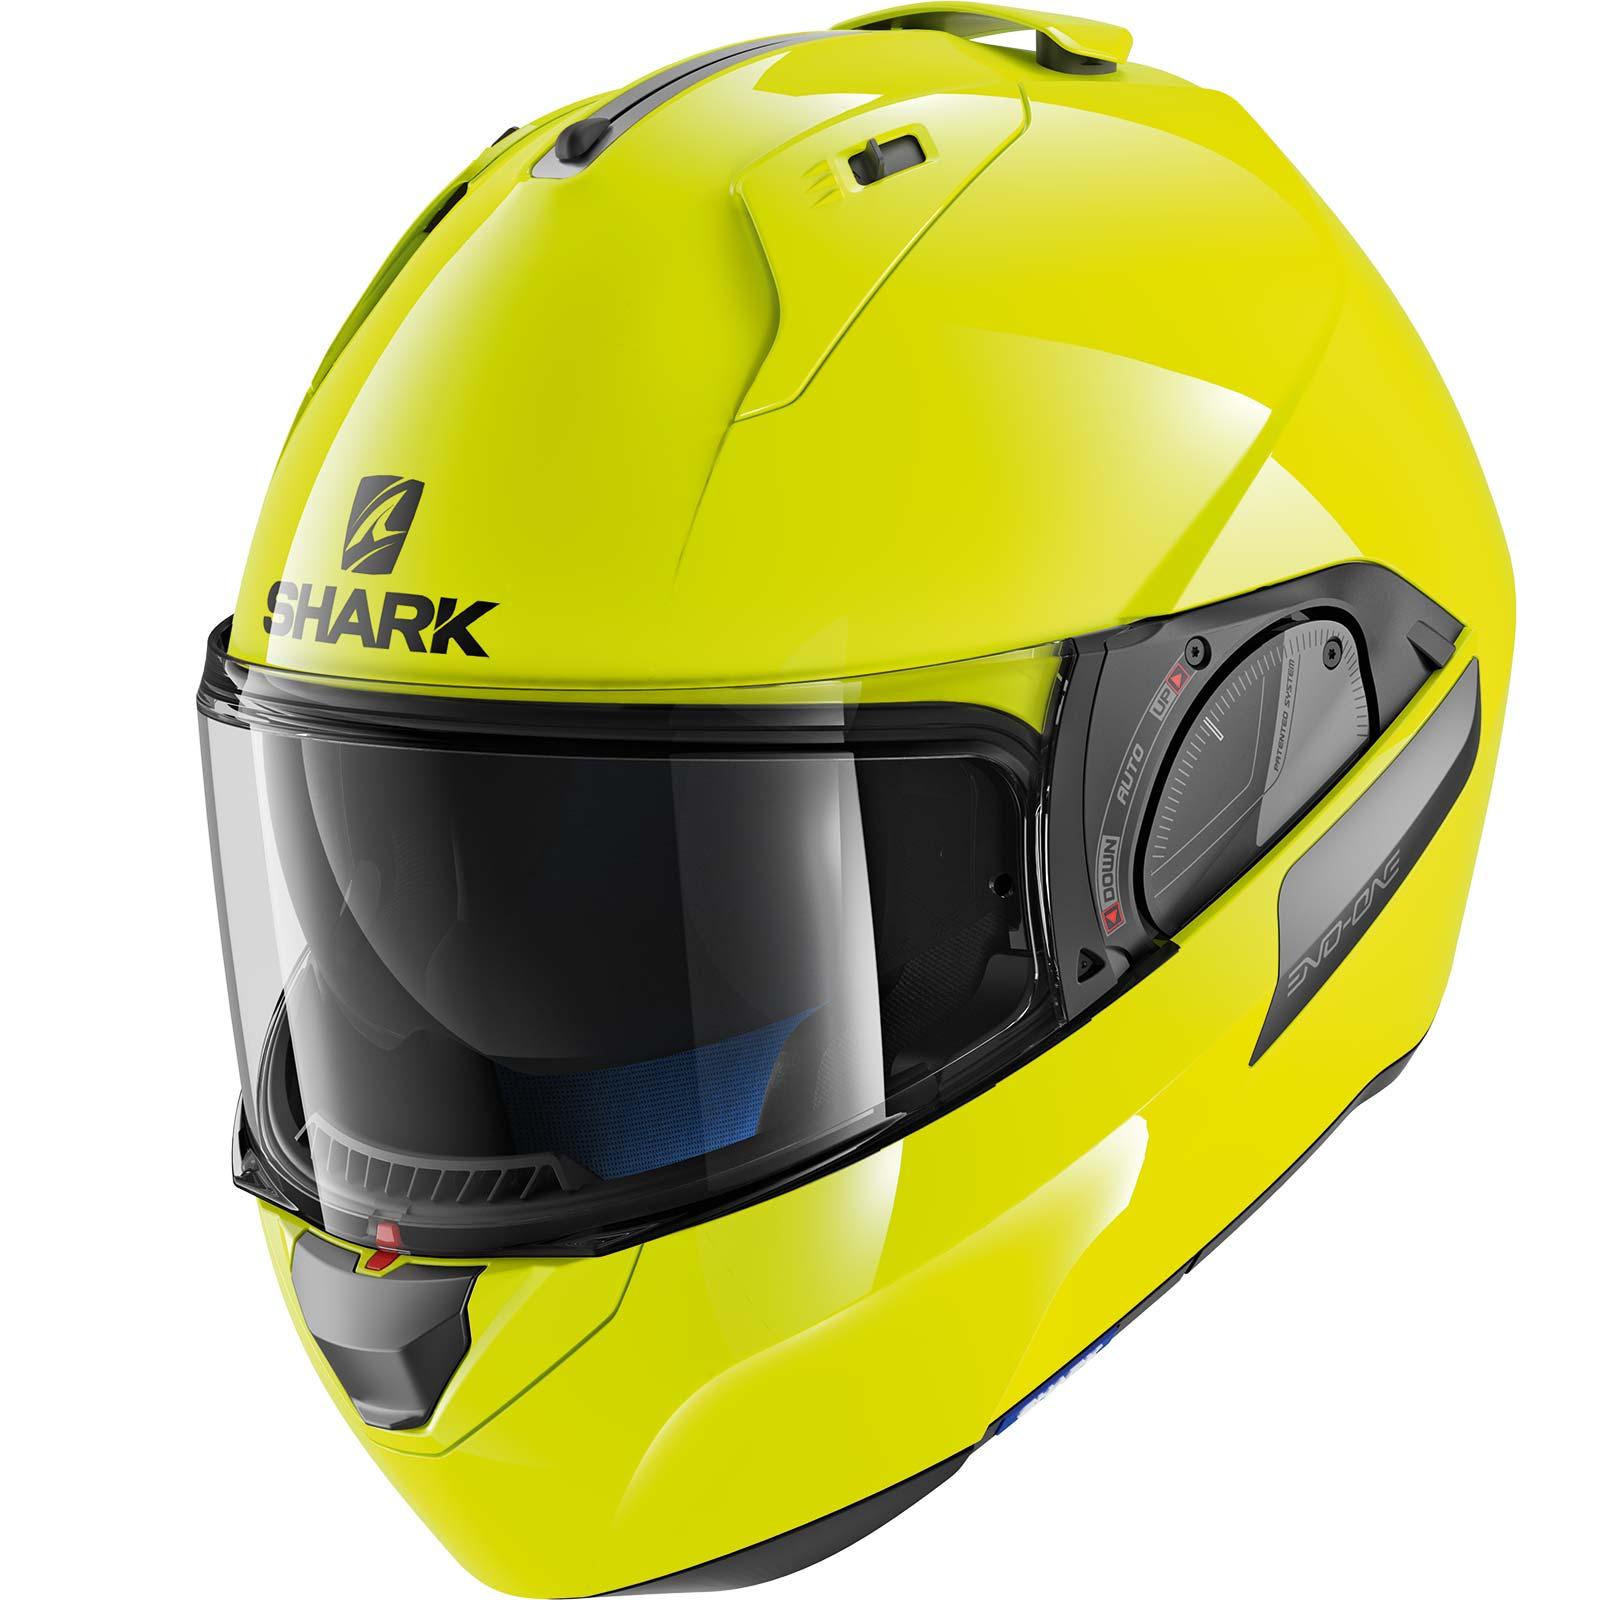 shark evo one 2 hi visibility yellow motorcycle motorbike bike flip front helmet ebay. Black Bedroom Furniture Sets. Home Design Ideas